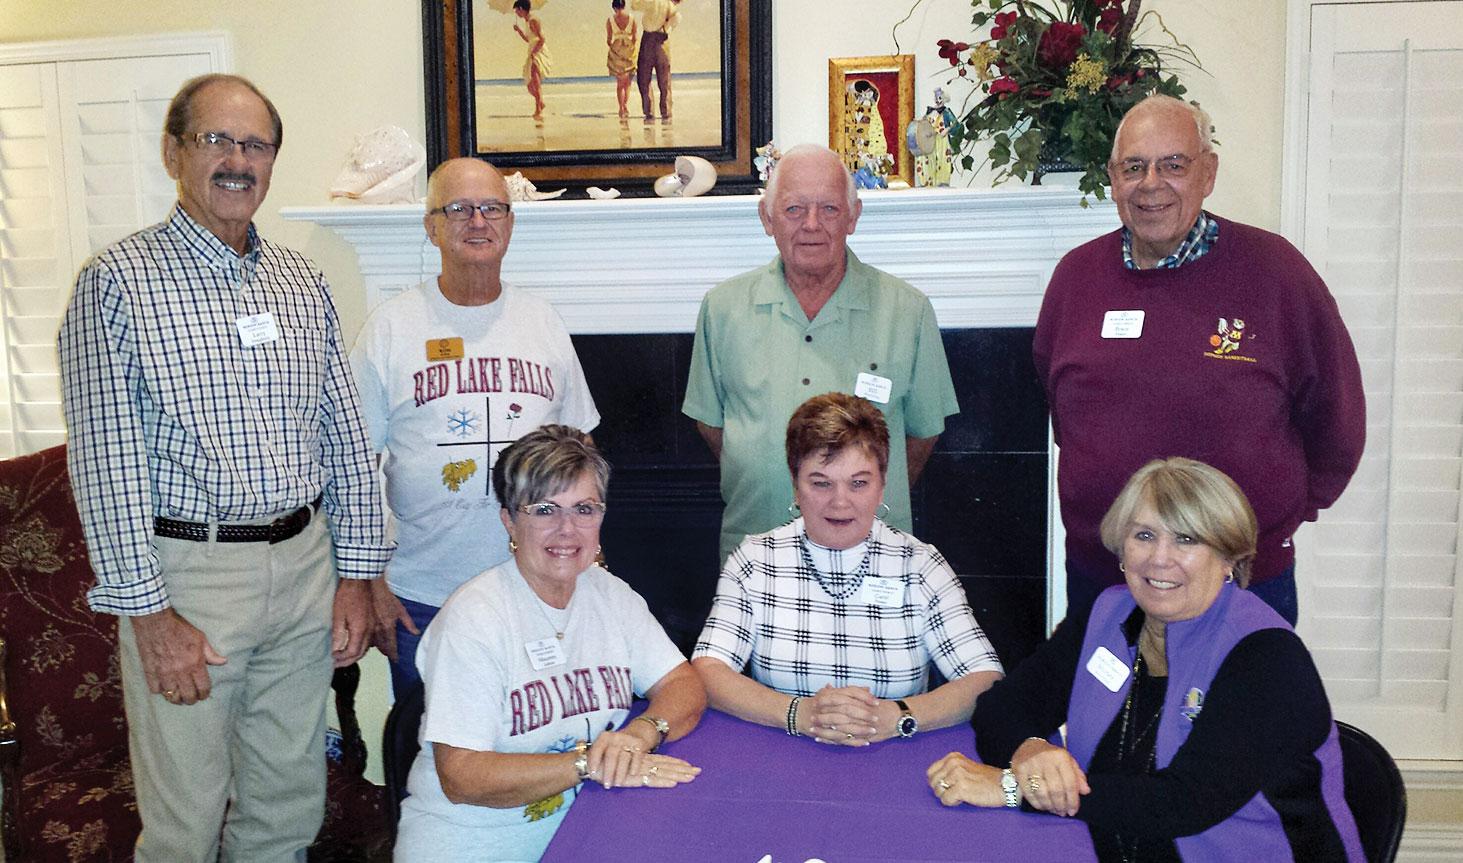 Left to right: Larry Dougherty, Ron Lehrer, Bill Revering, Bruce Foster, Maureen Lehrer, Carol Foster and Shirley Revering